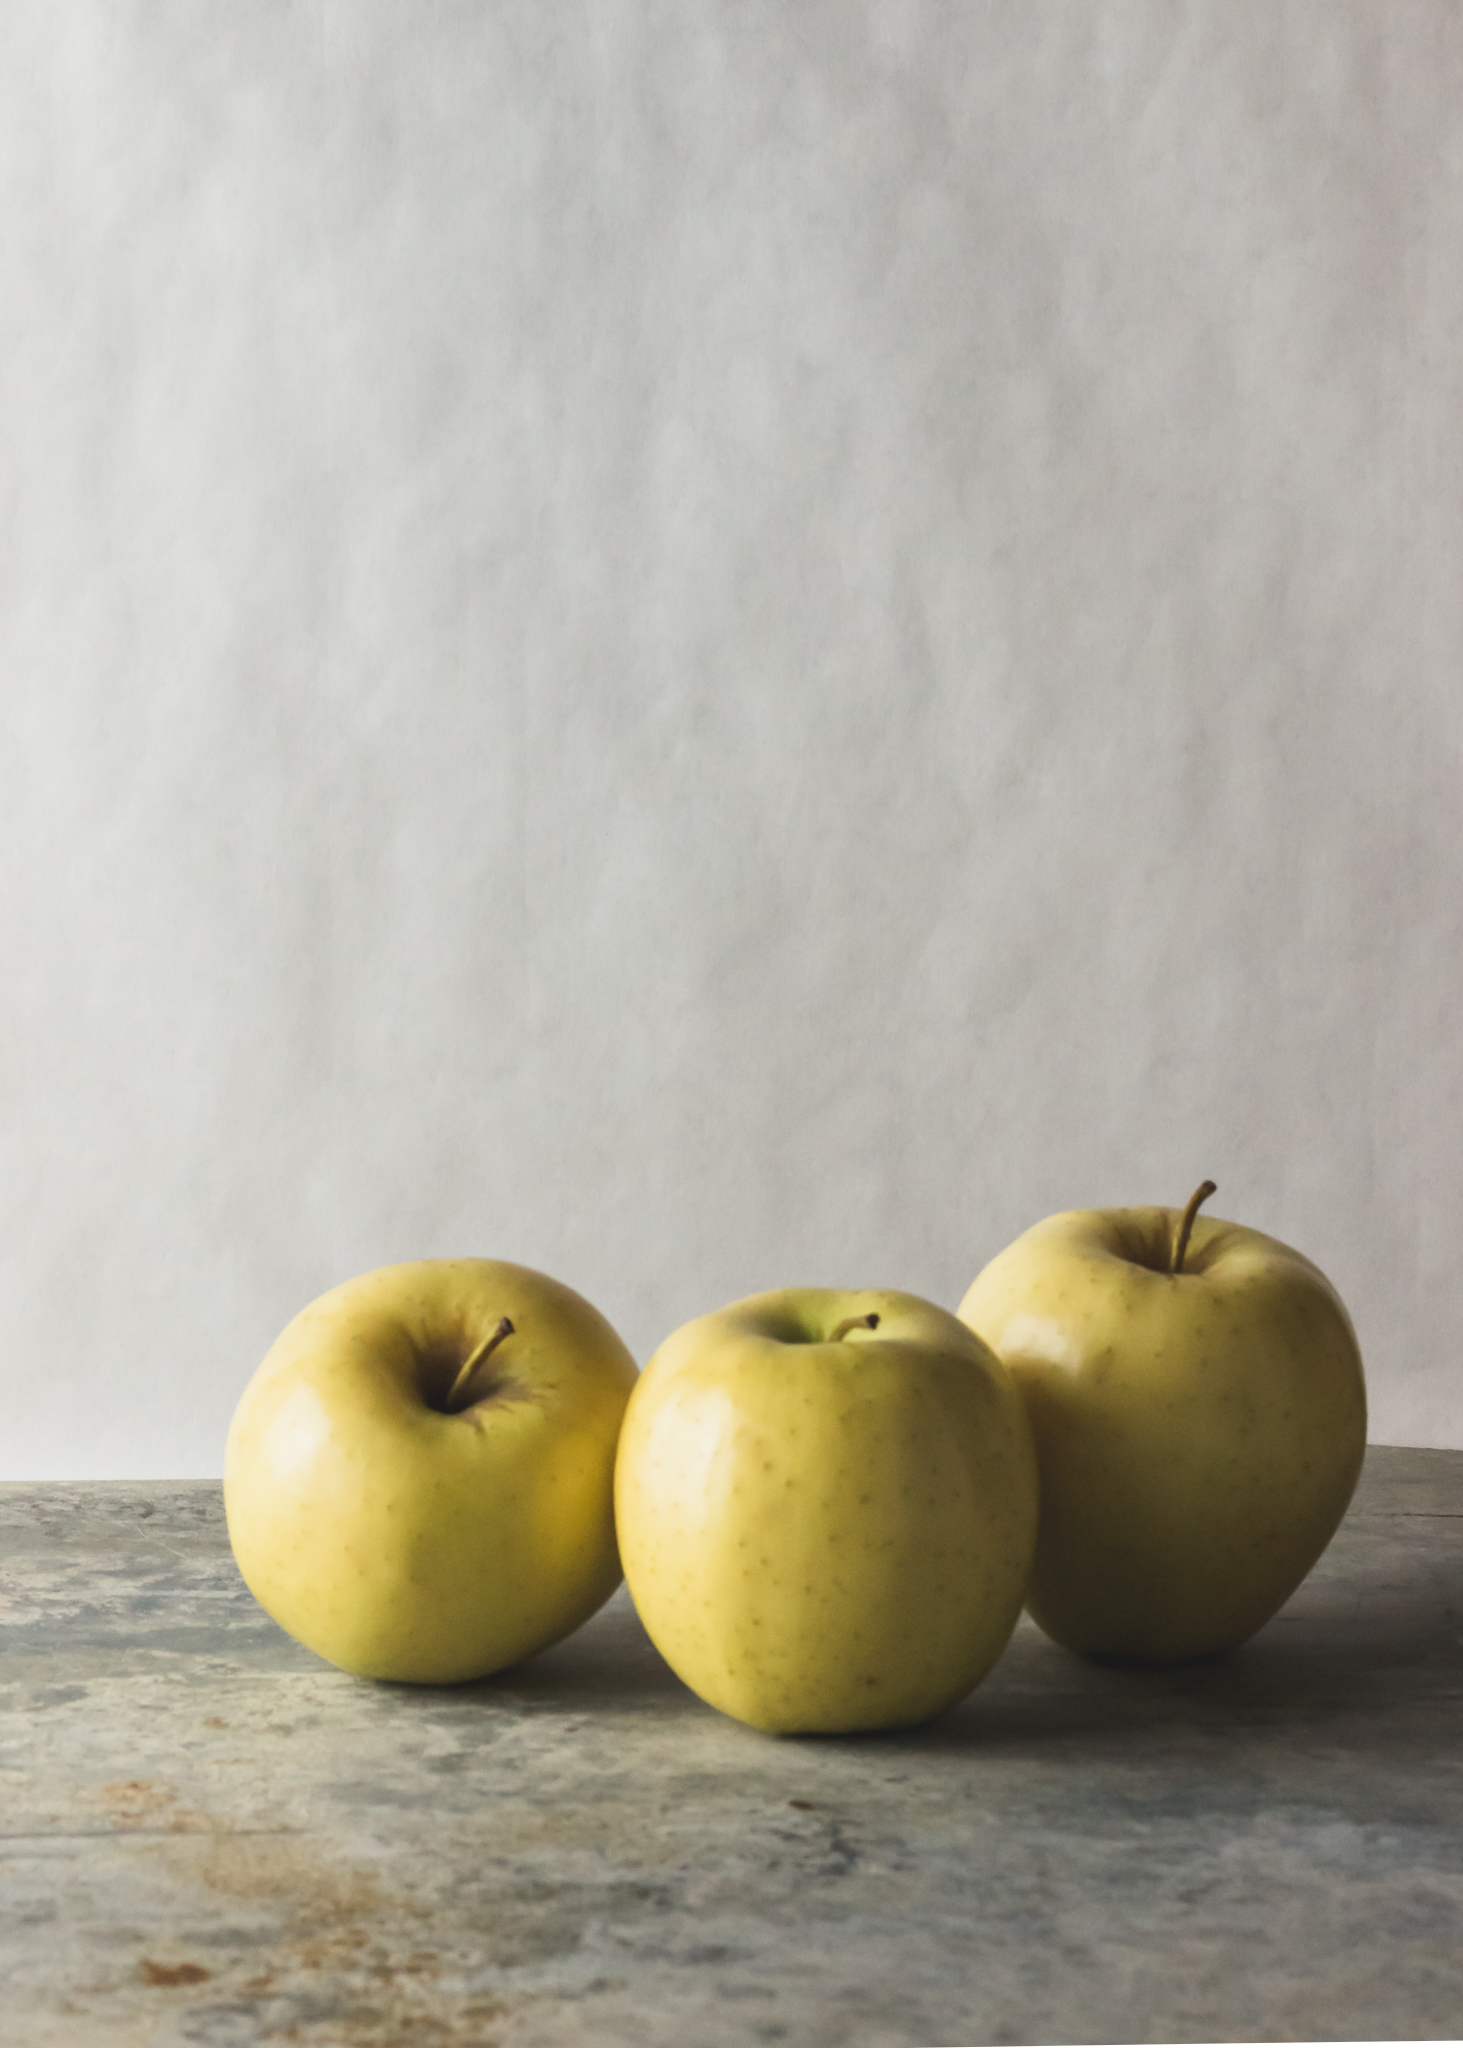 Three Apples 5x7.JPG